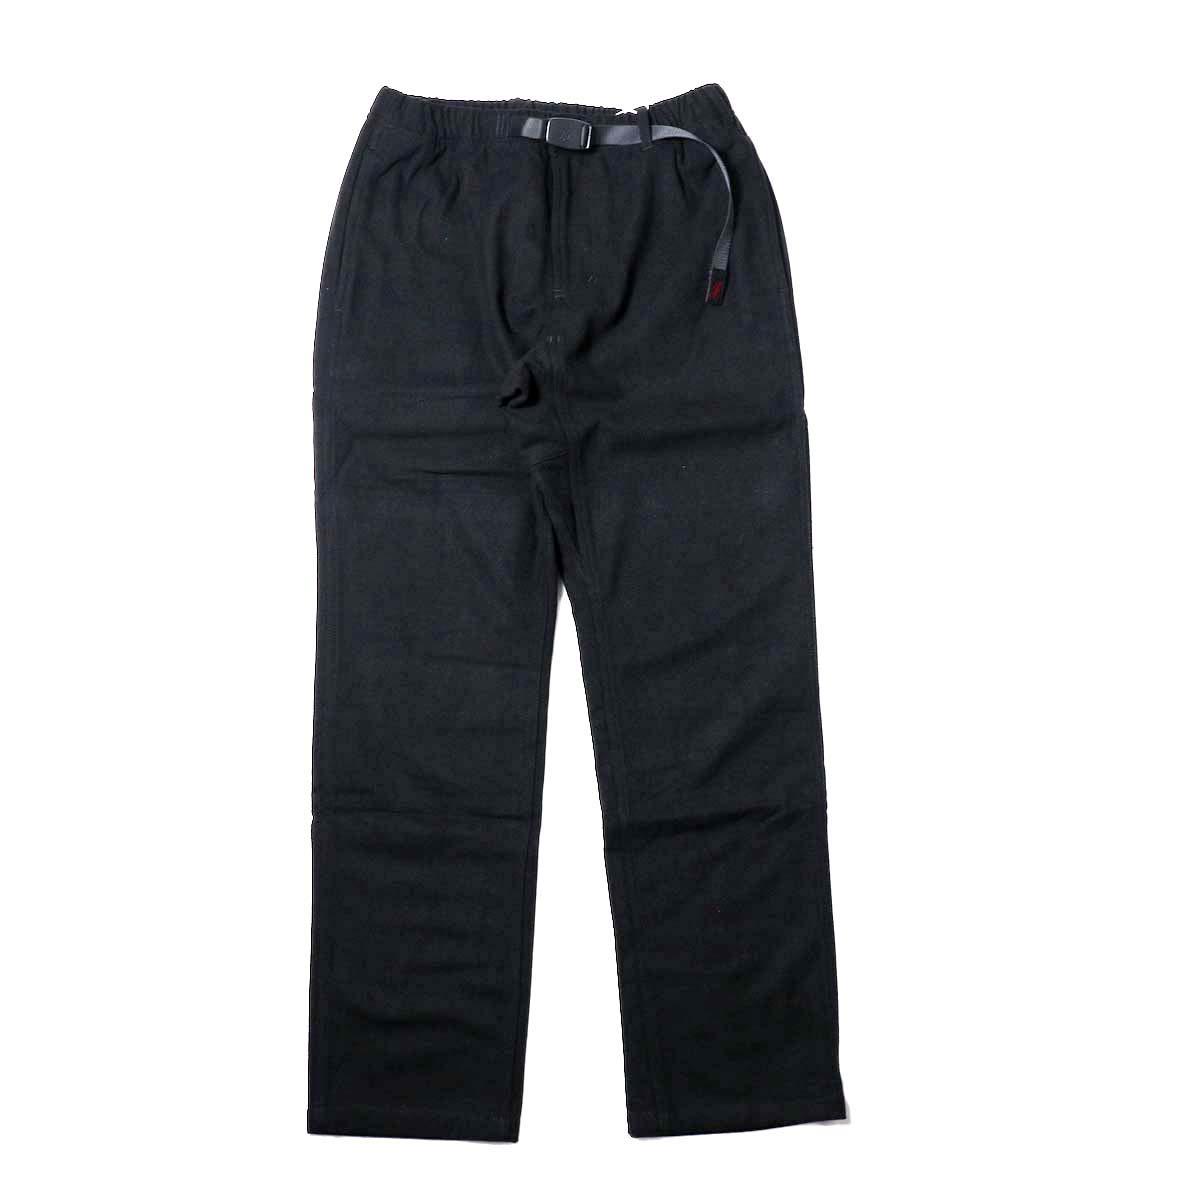 GRAMICCI / WOOL BLEND ST-PANTS (Black)